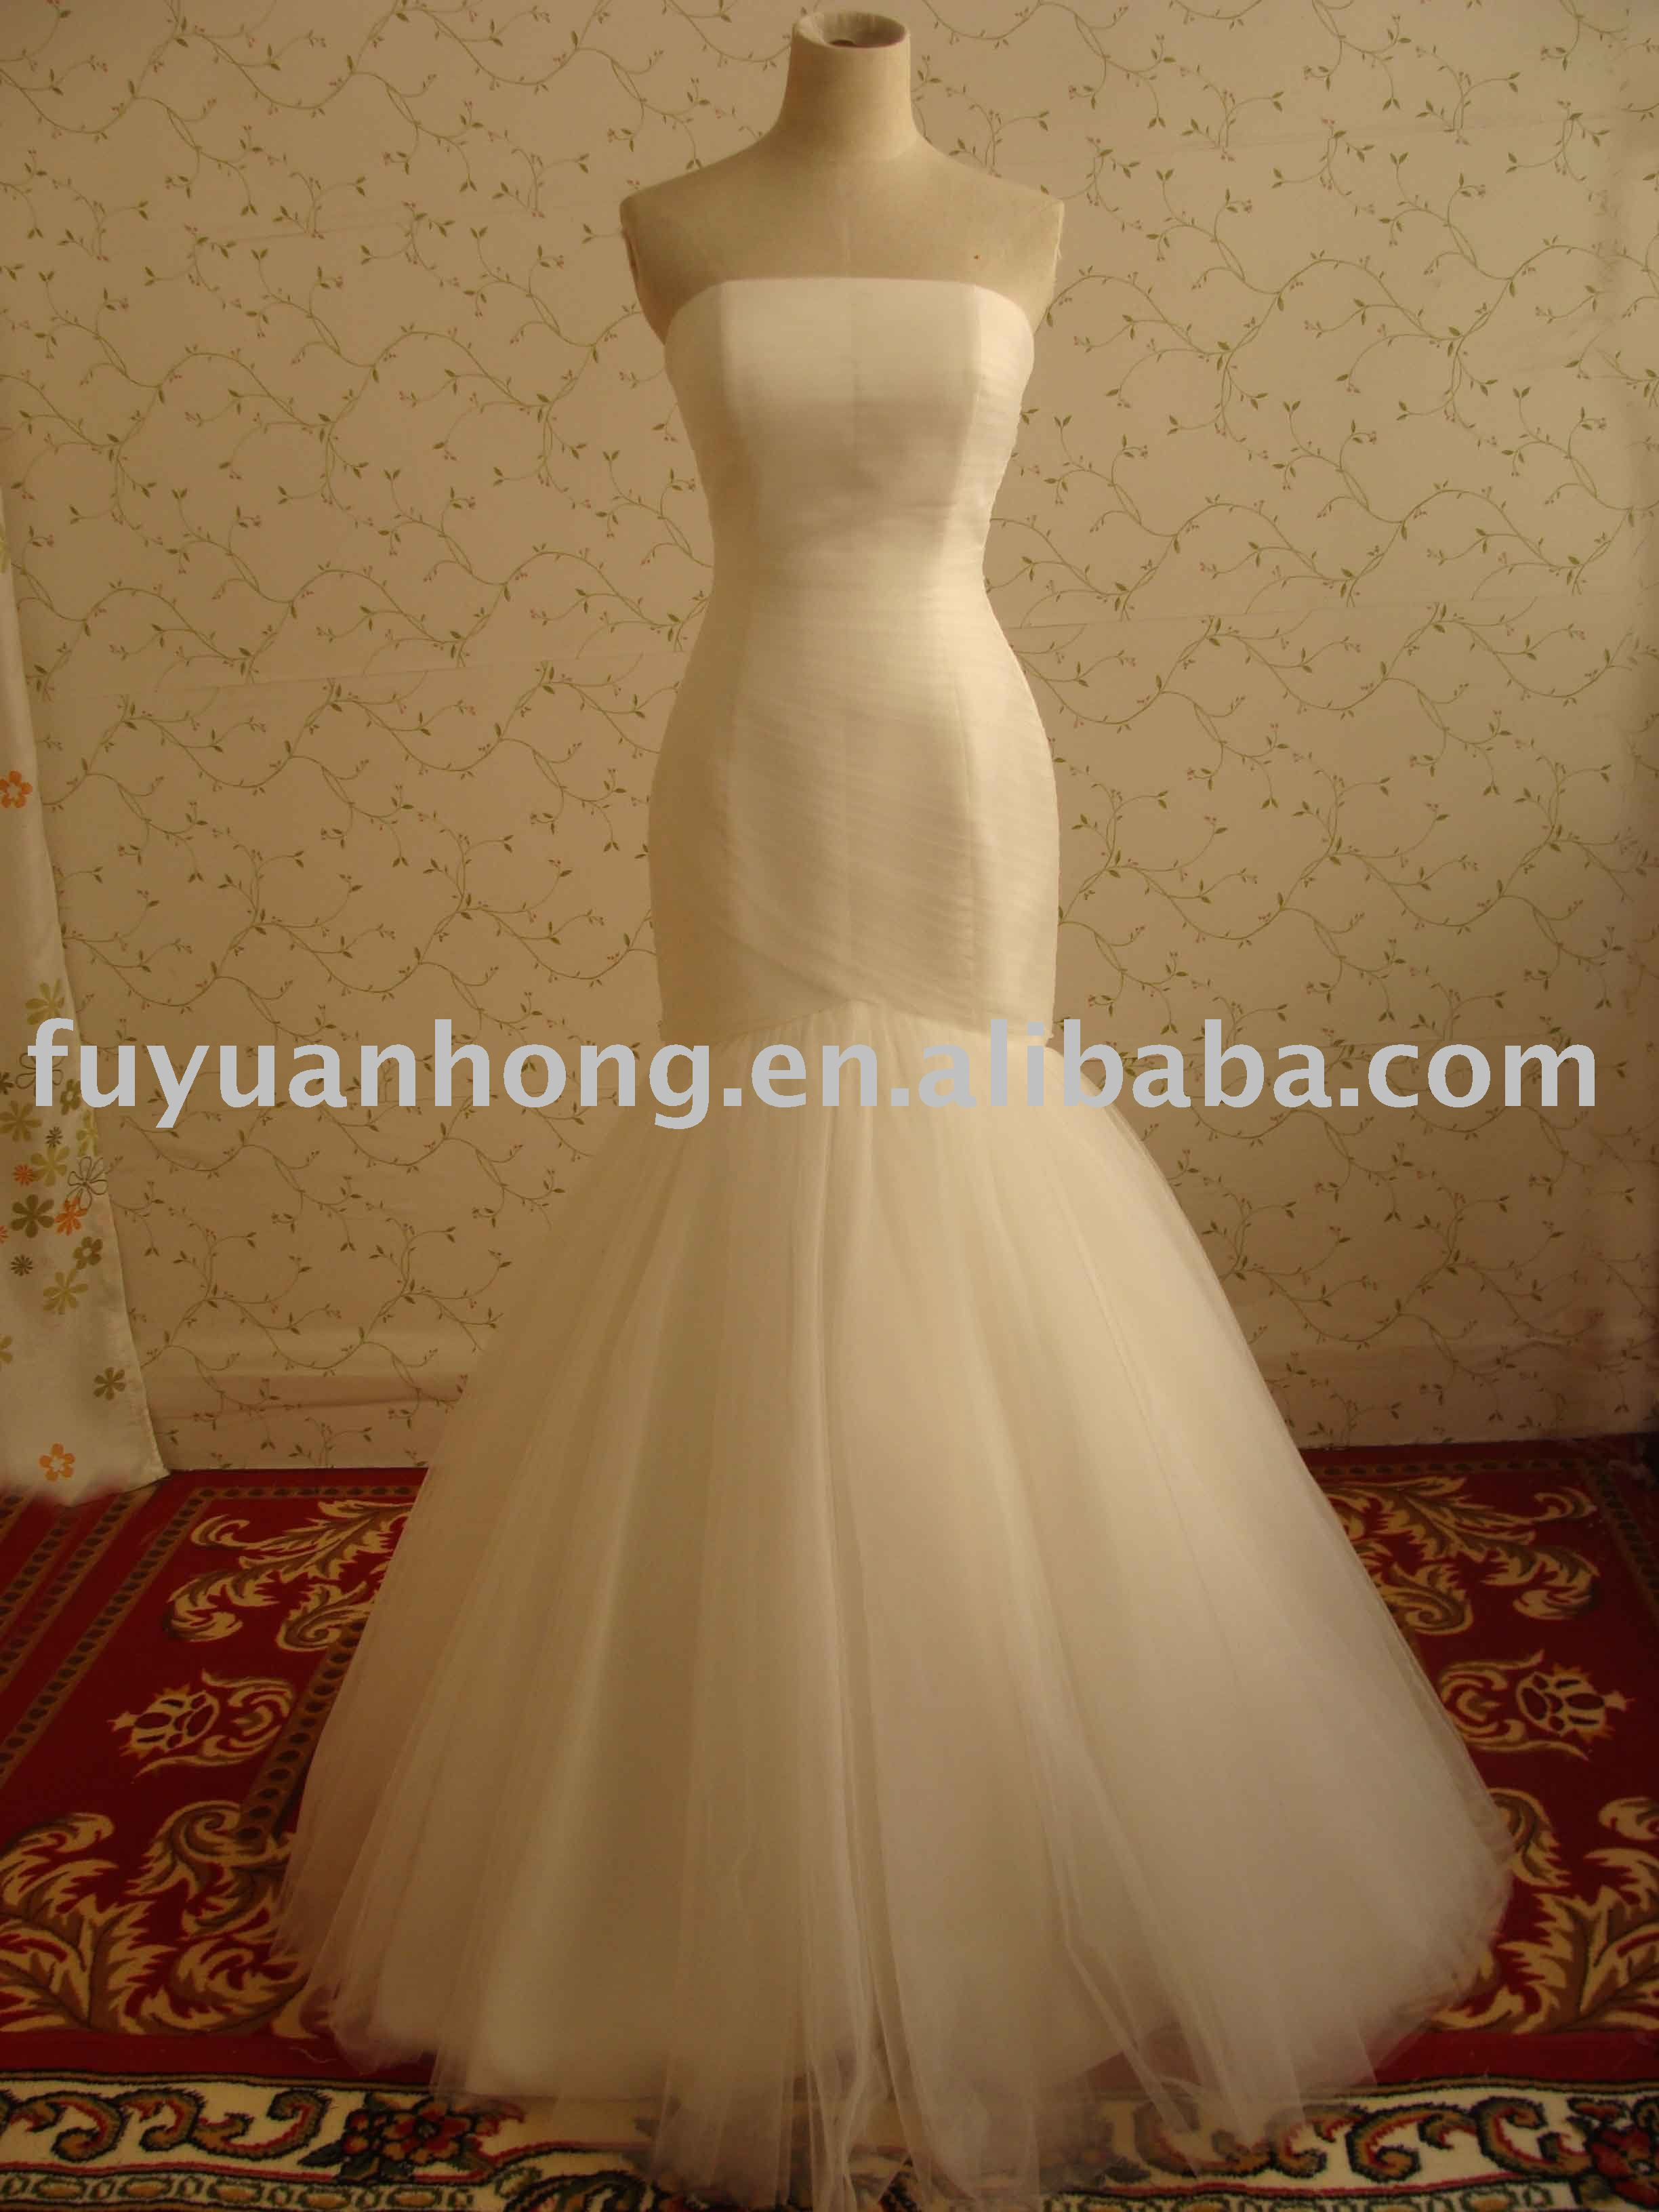 Fishtail Bridal Dress, Fishtail Bridal Dress Suppliers and ...